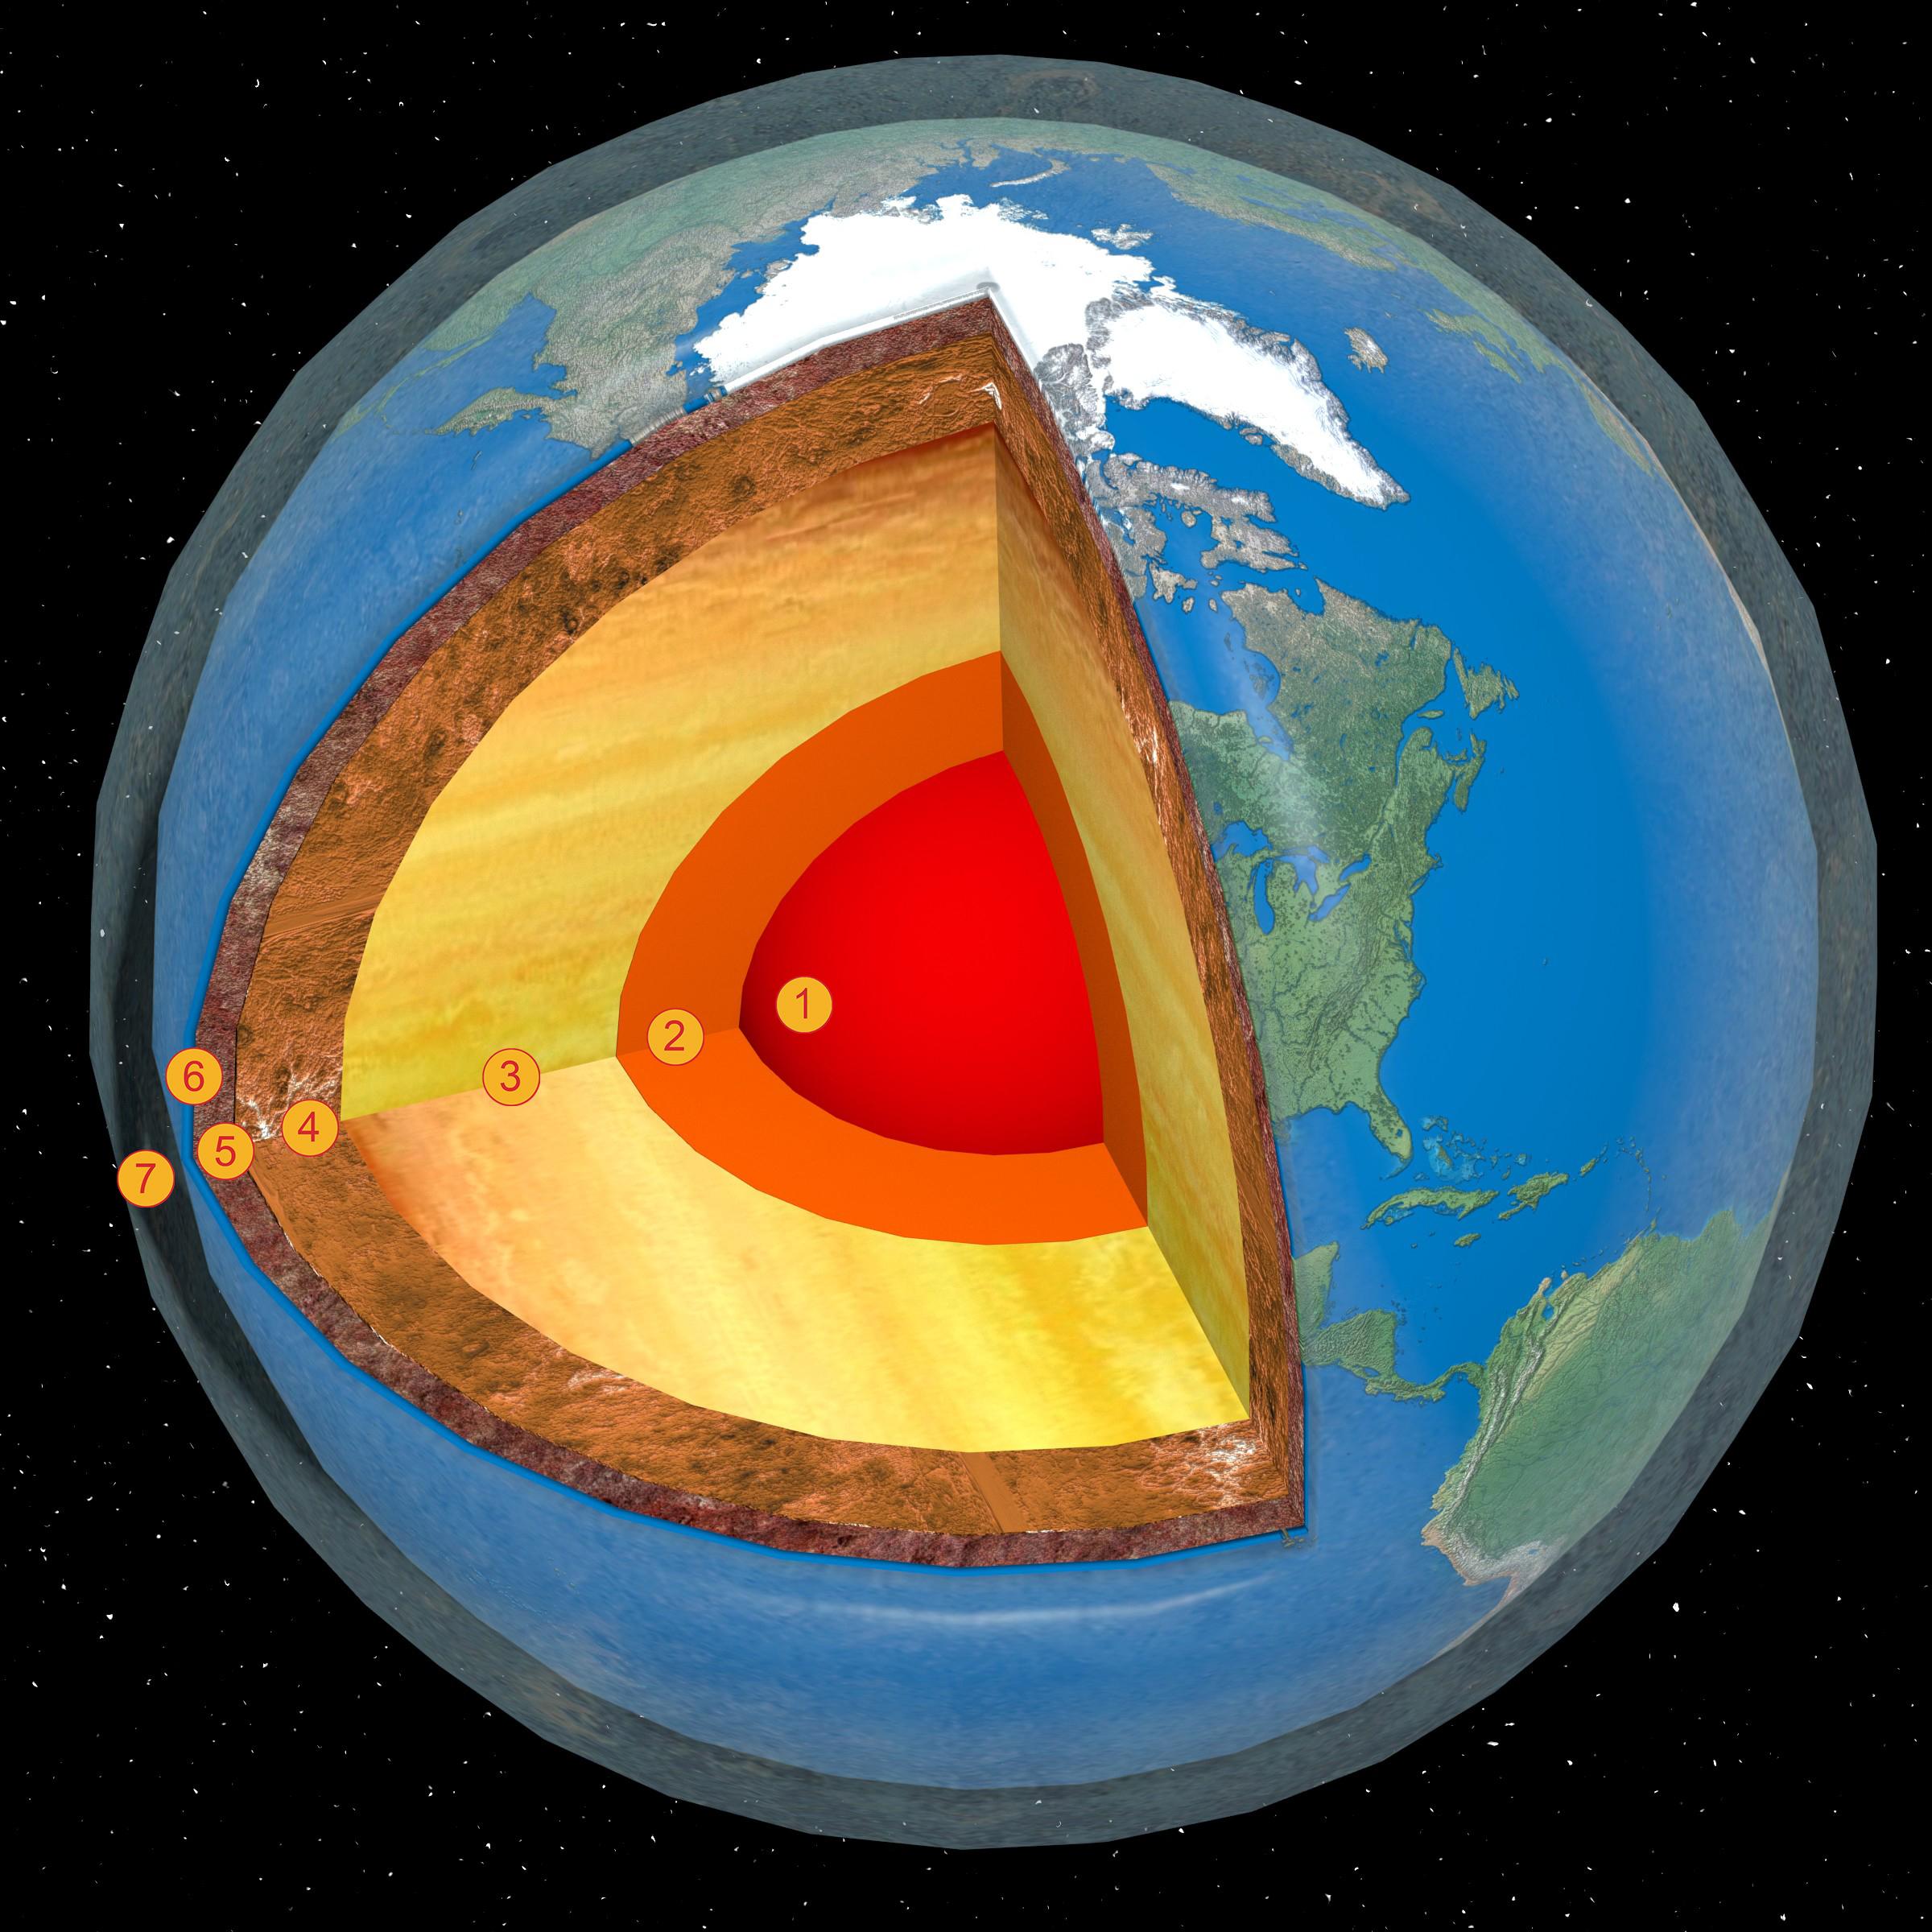 Pamantul si energia geotermala - Energia geotermala ca sursa de energie regenerabila